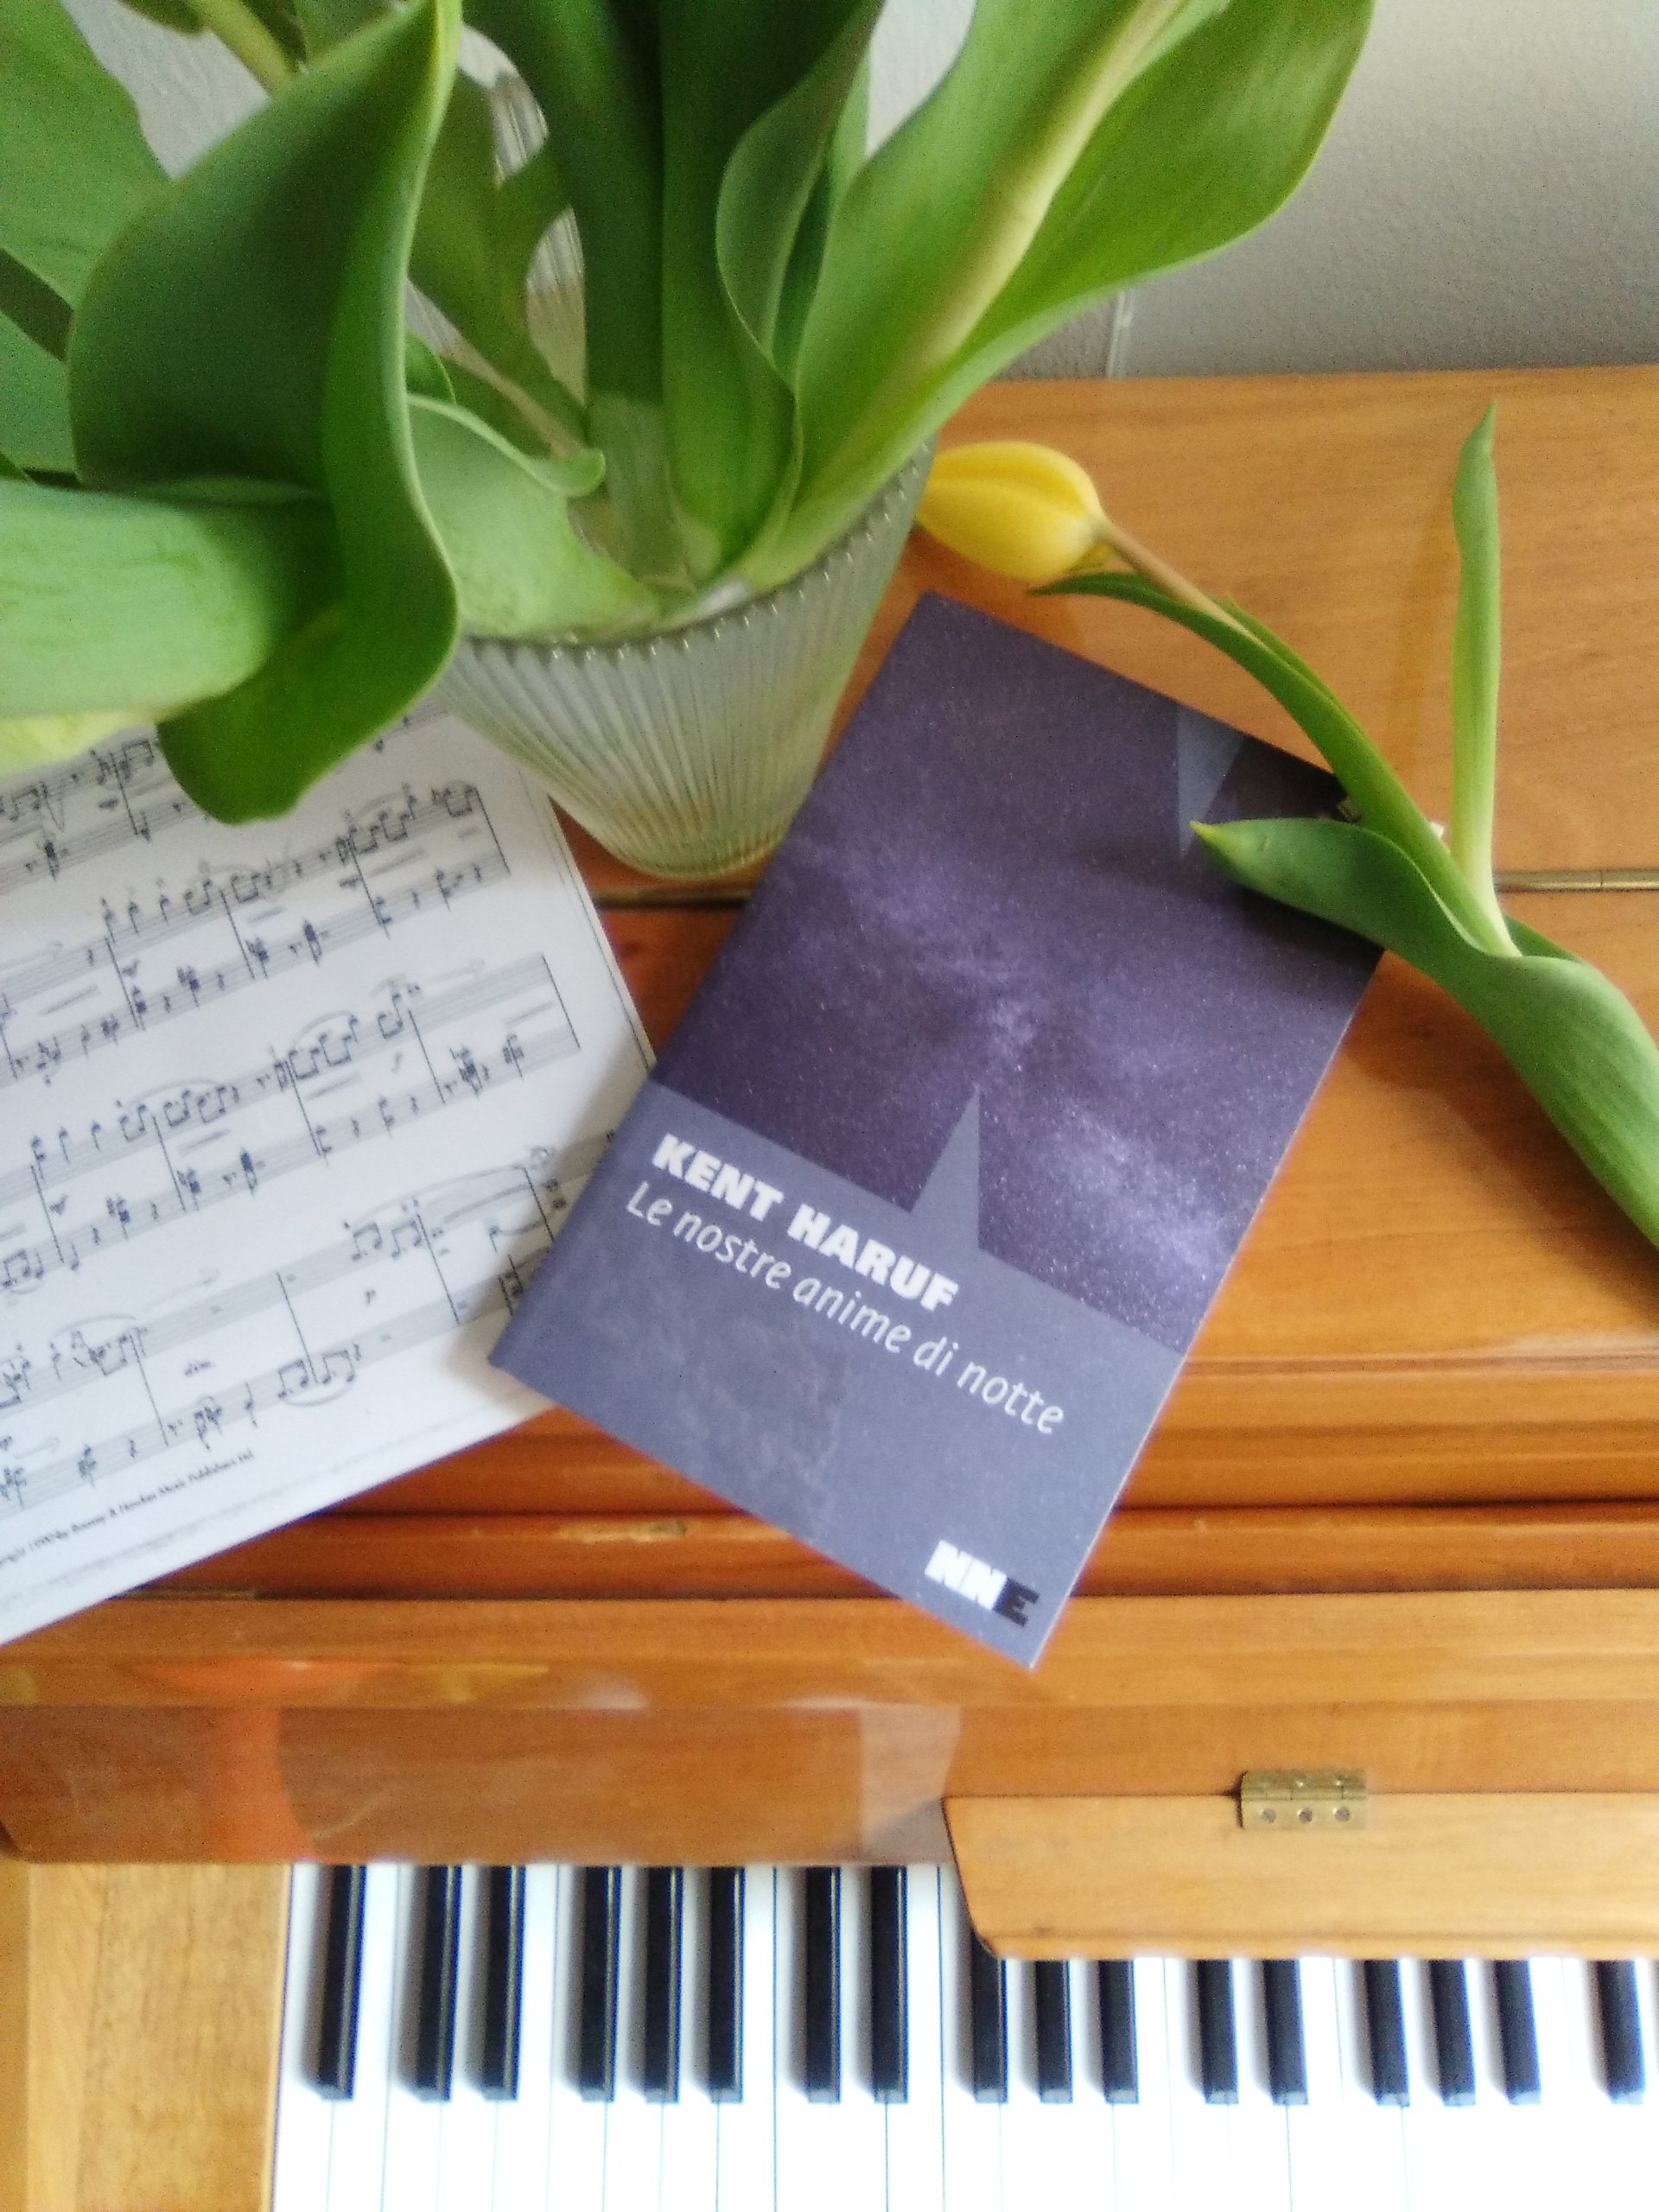 Haruf piano